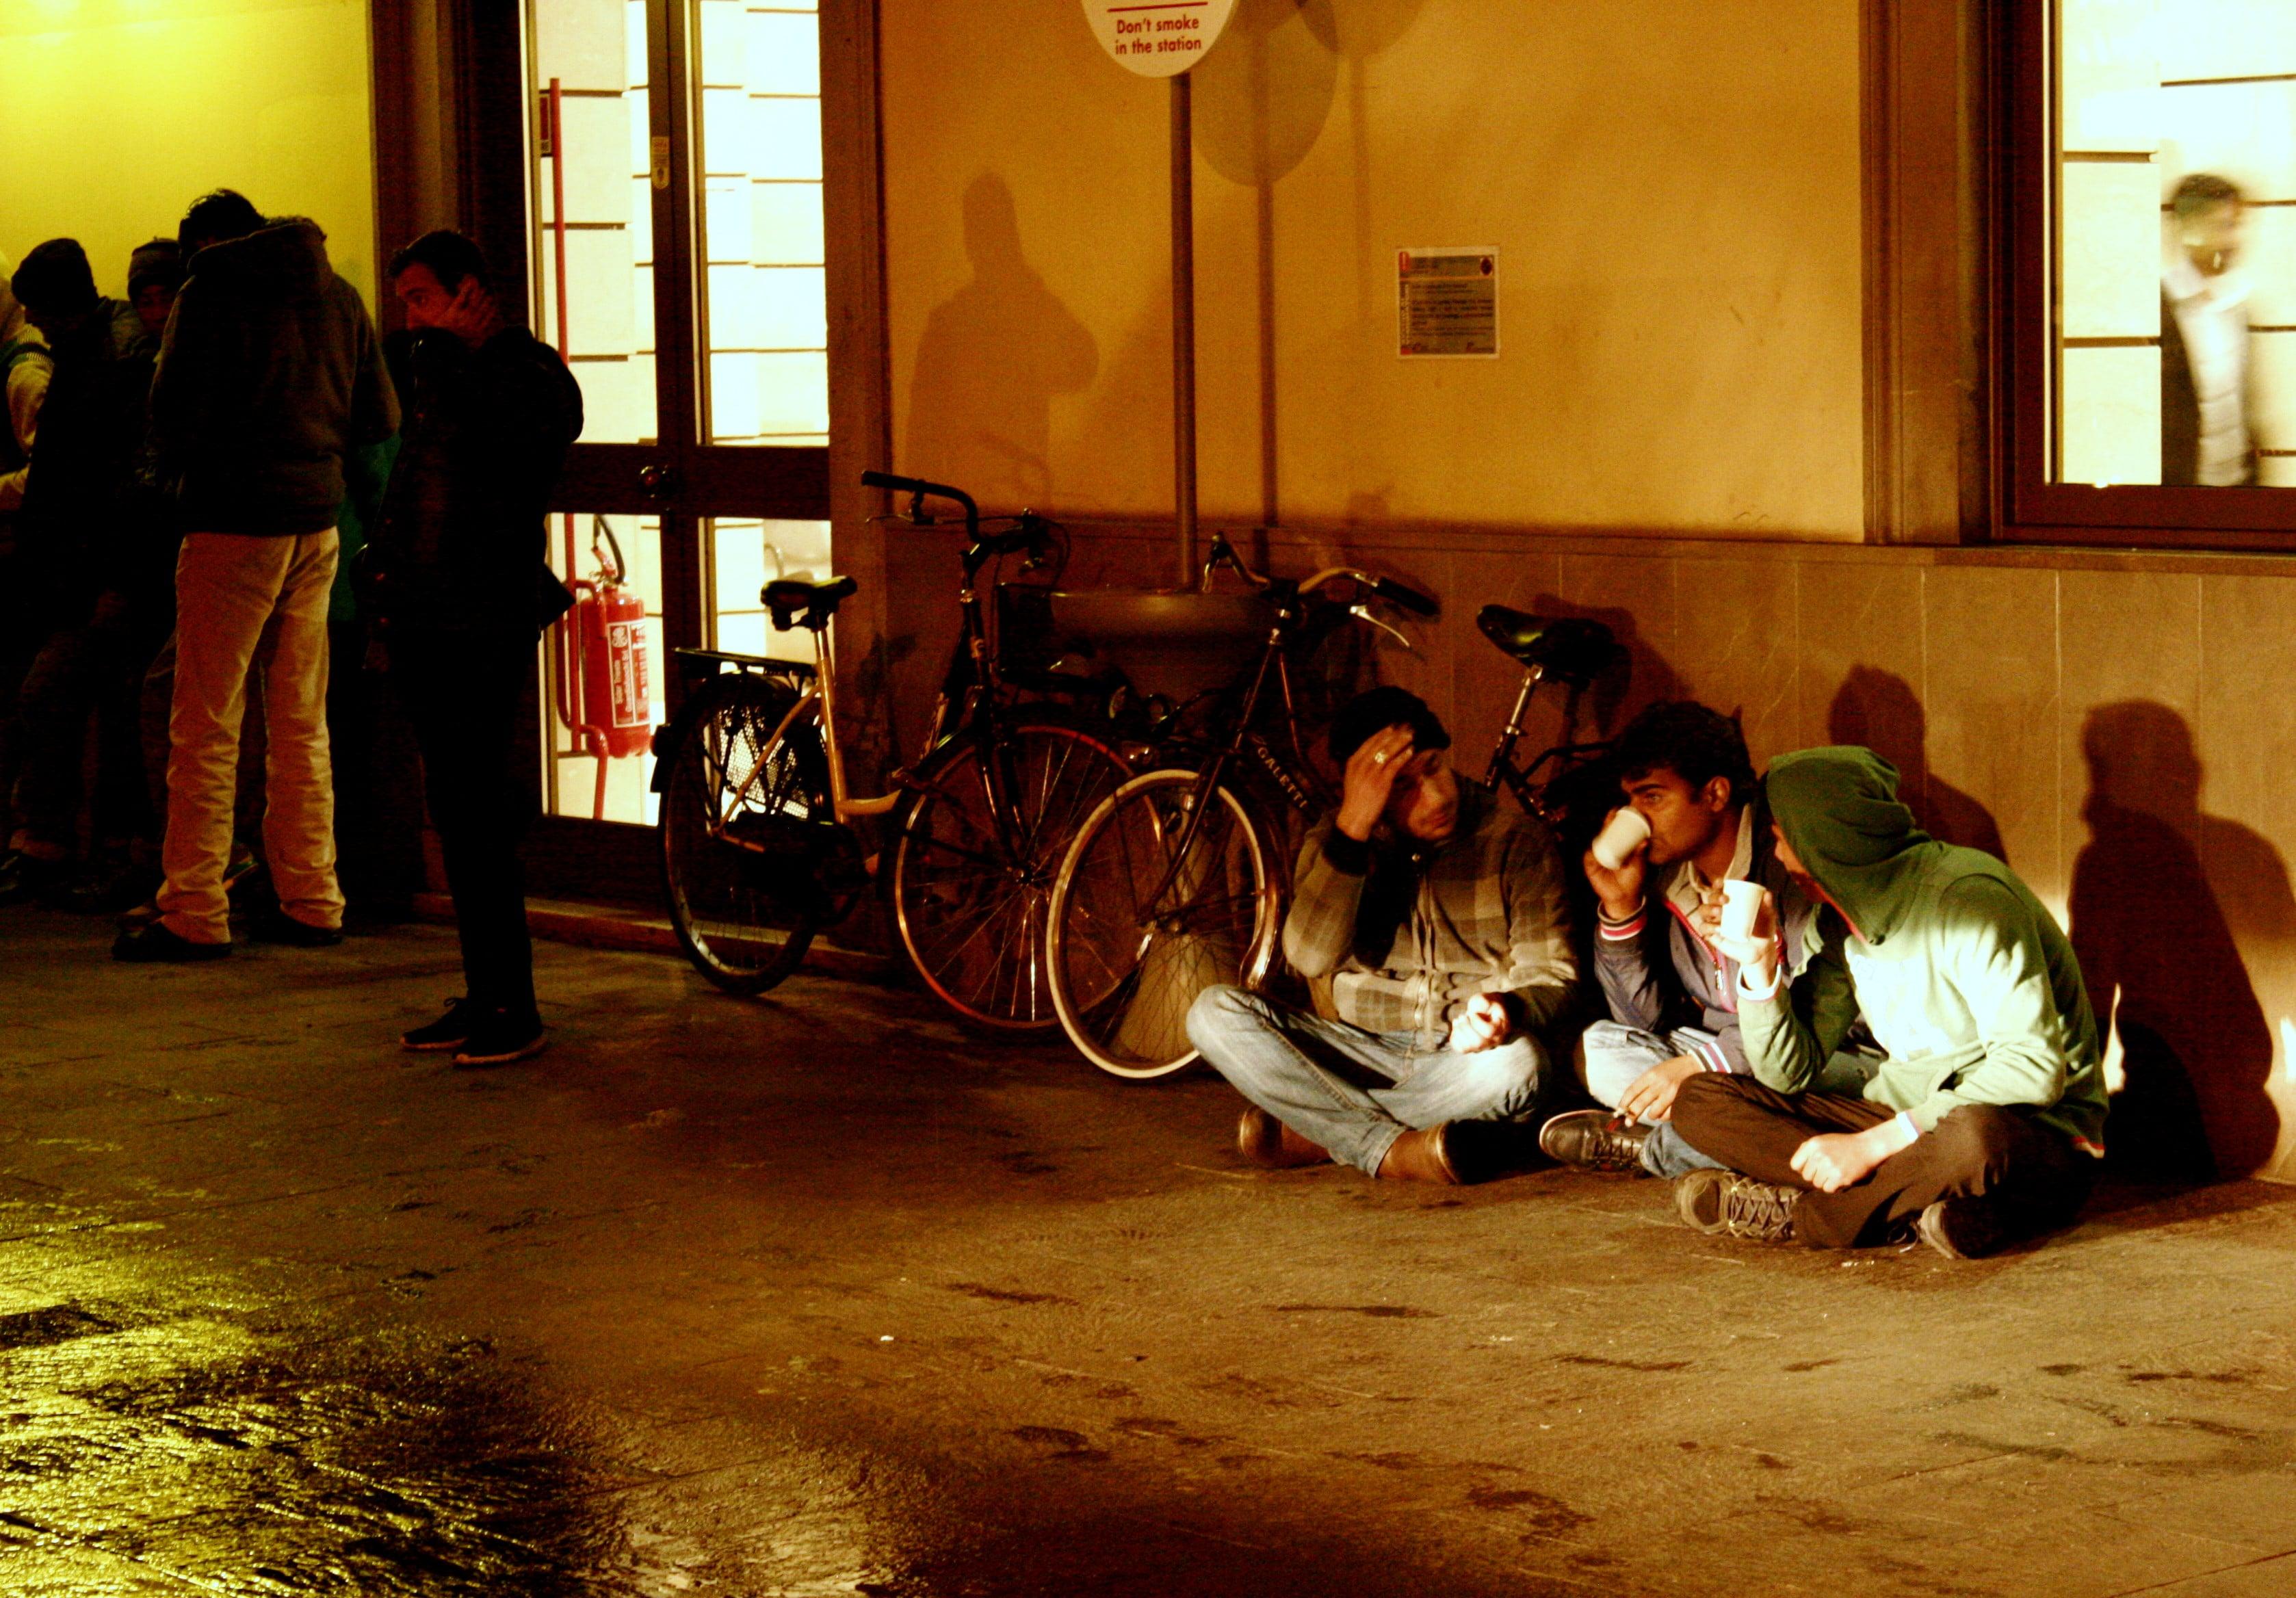 Migranti stazione di Udine 1